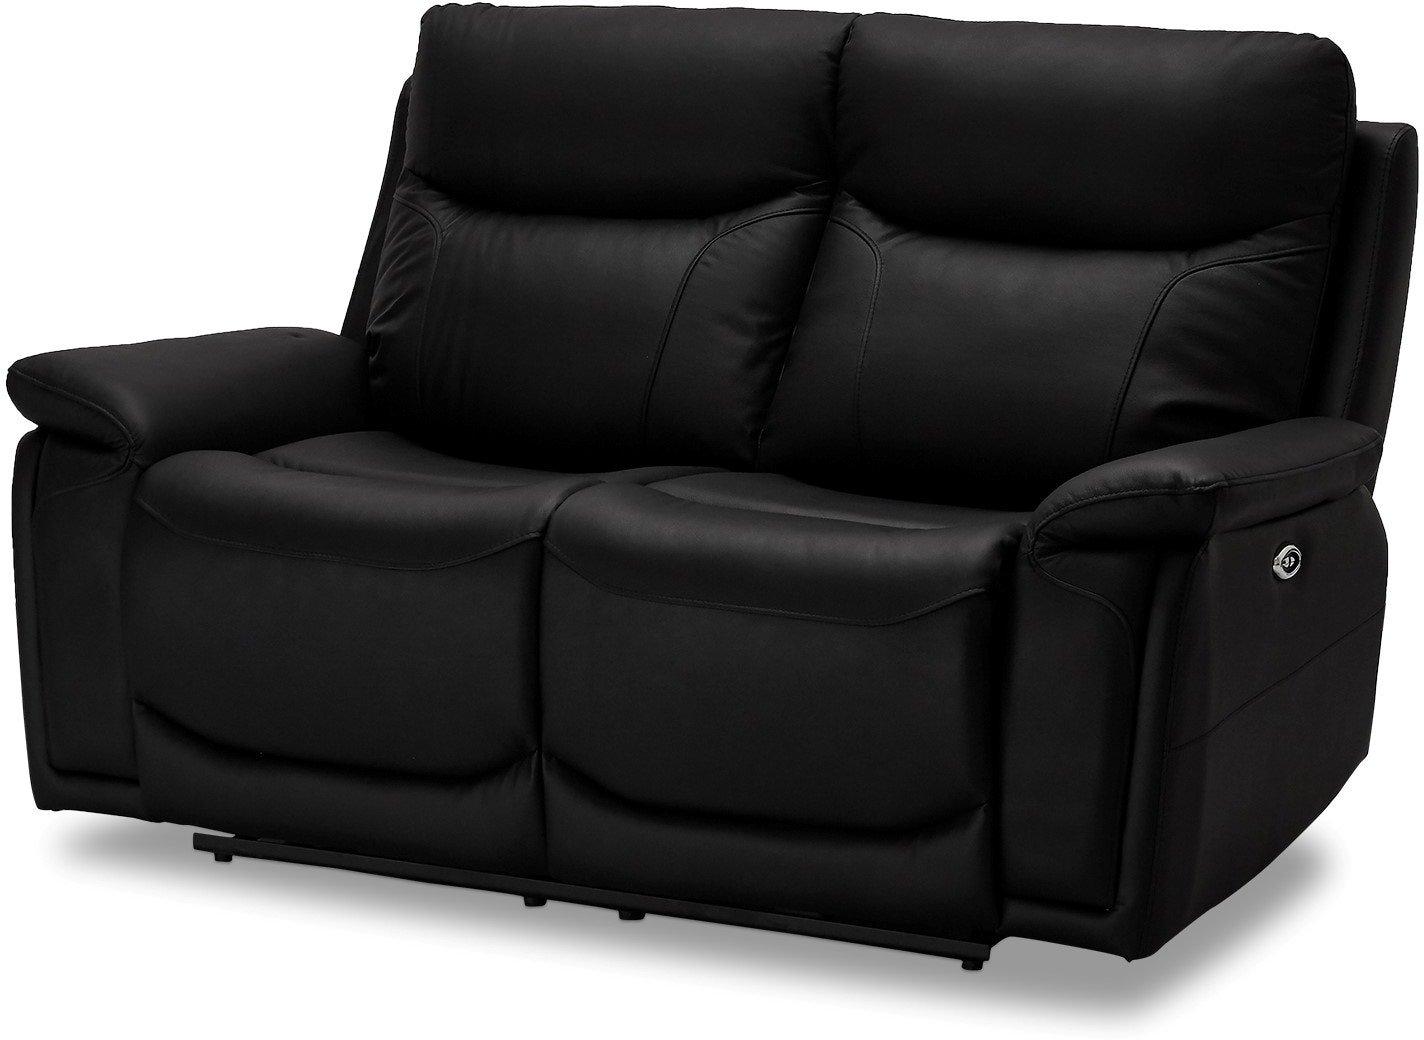 Stirling, 2-personers sofa, Ægte læder by Raymond & Hallmark (H: 100 cm. B: 166 cm. L: 99 cm., Sort)